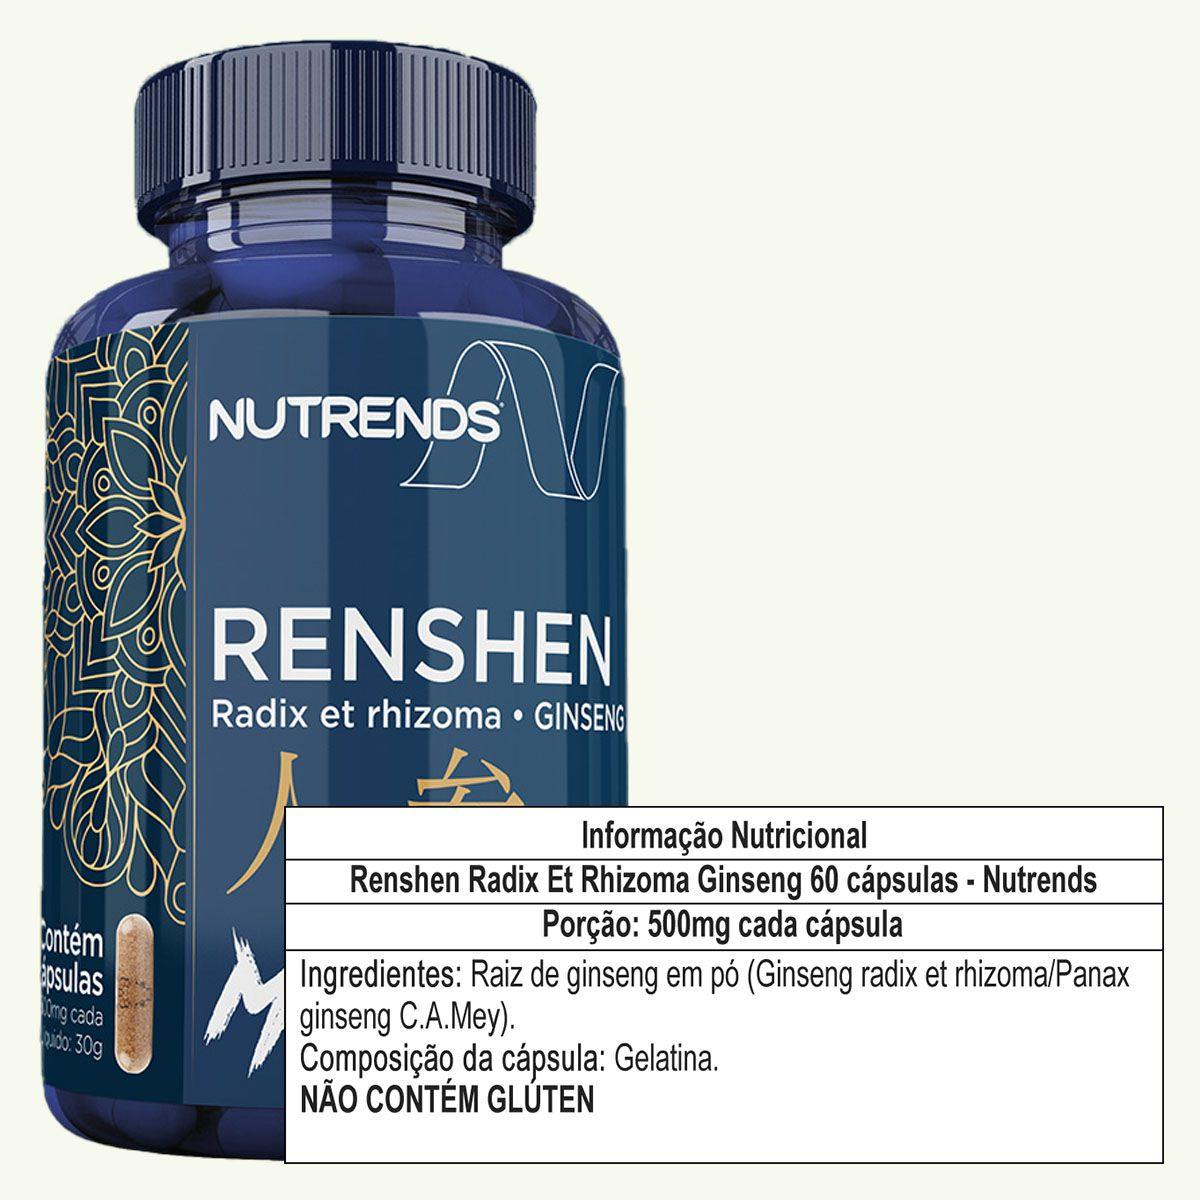 Renshen Radix Et Rhizoma Ginseng 500mg 60 cápsulas - Nutrends